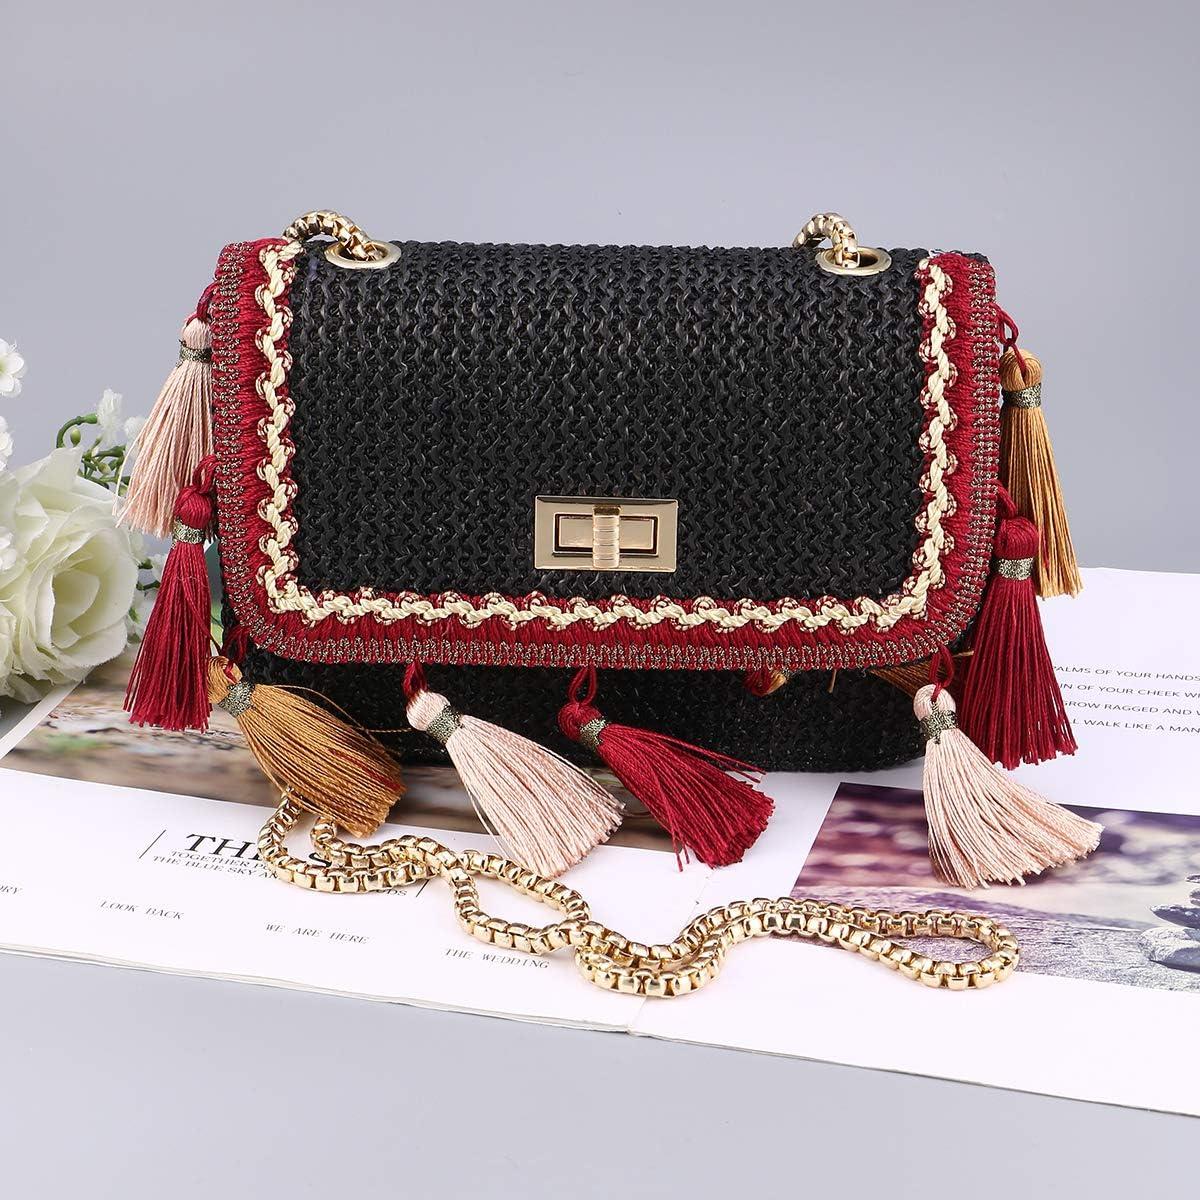 khaki FENICAL Fashion Tassel Straw Bag Mini Crossbody Bag Handmade Woven Bag Shoulder Bag for Women